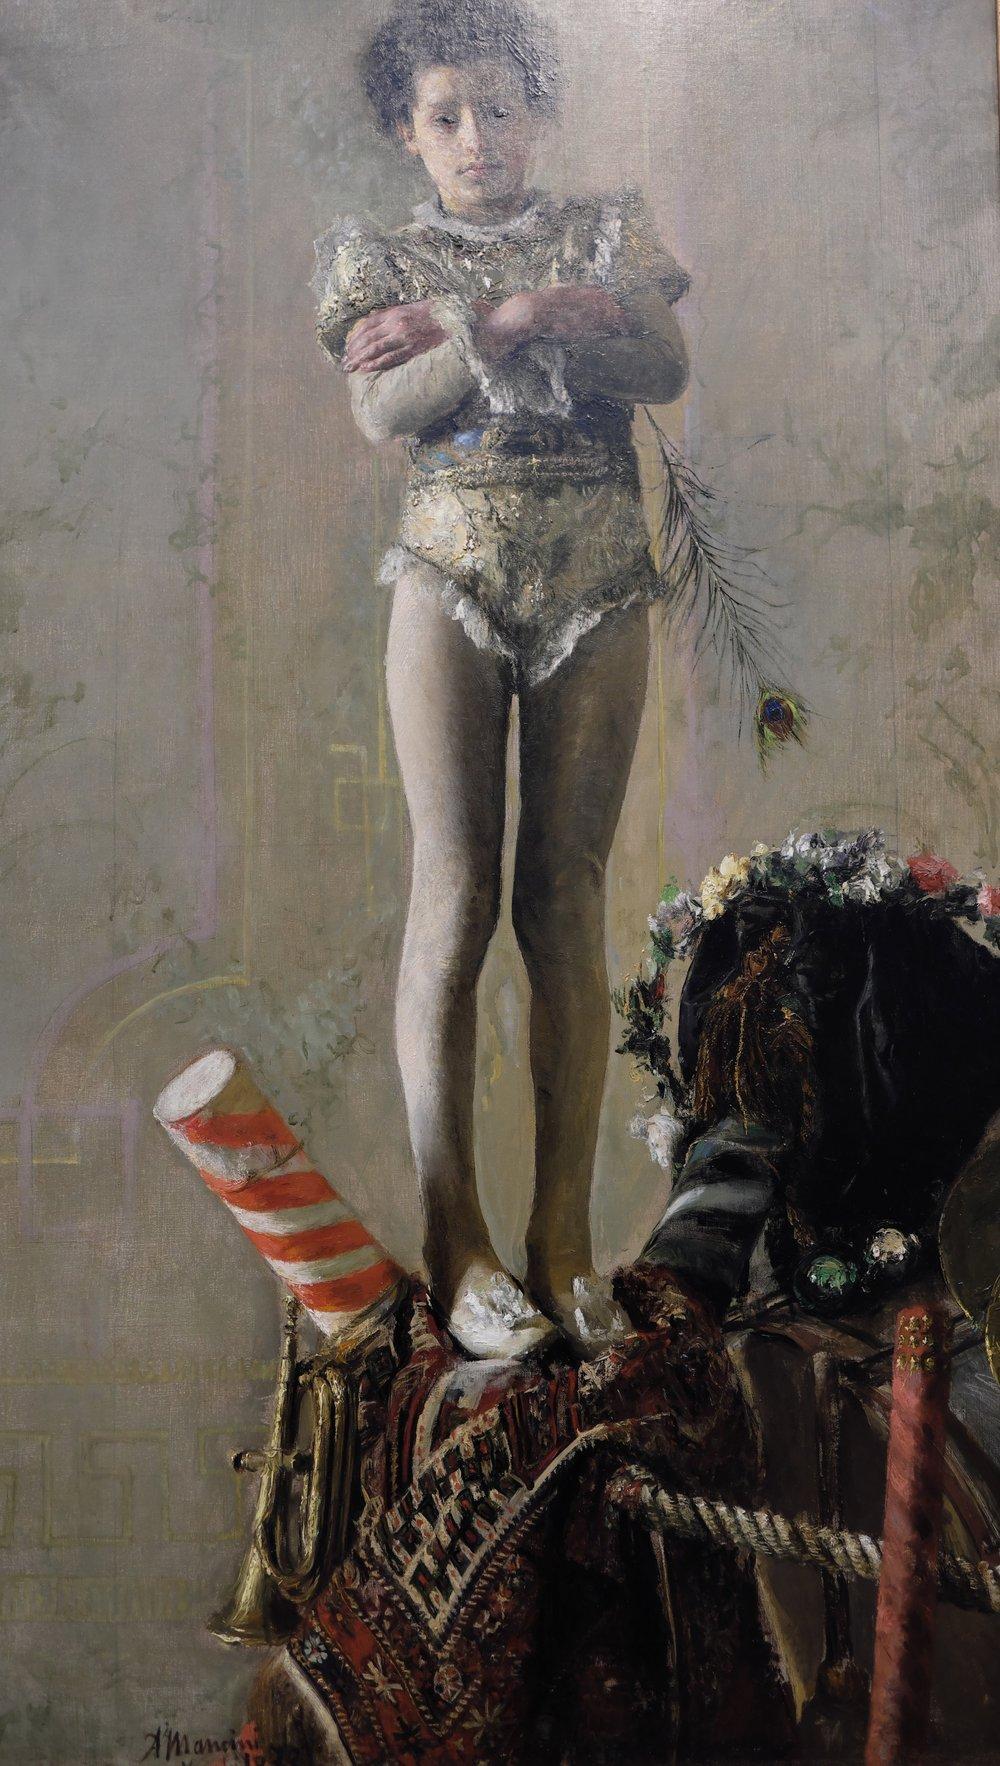 Il Saltimbanco, Antonio Mancini, 1879